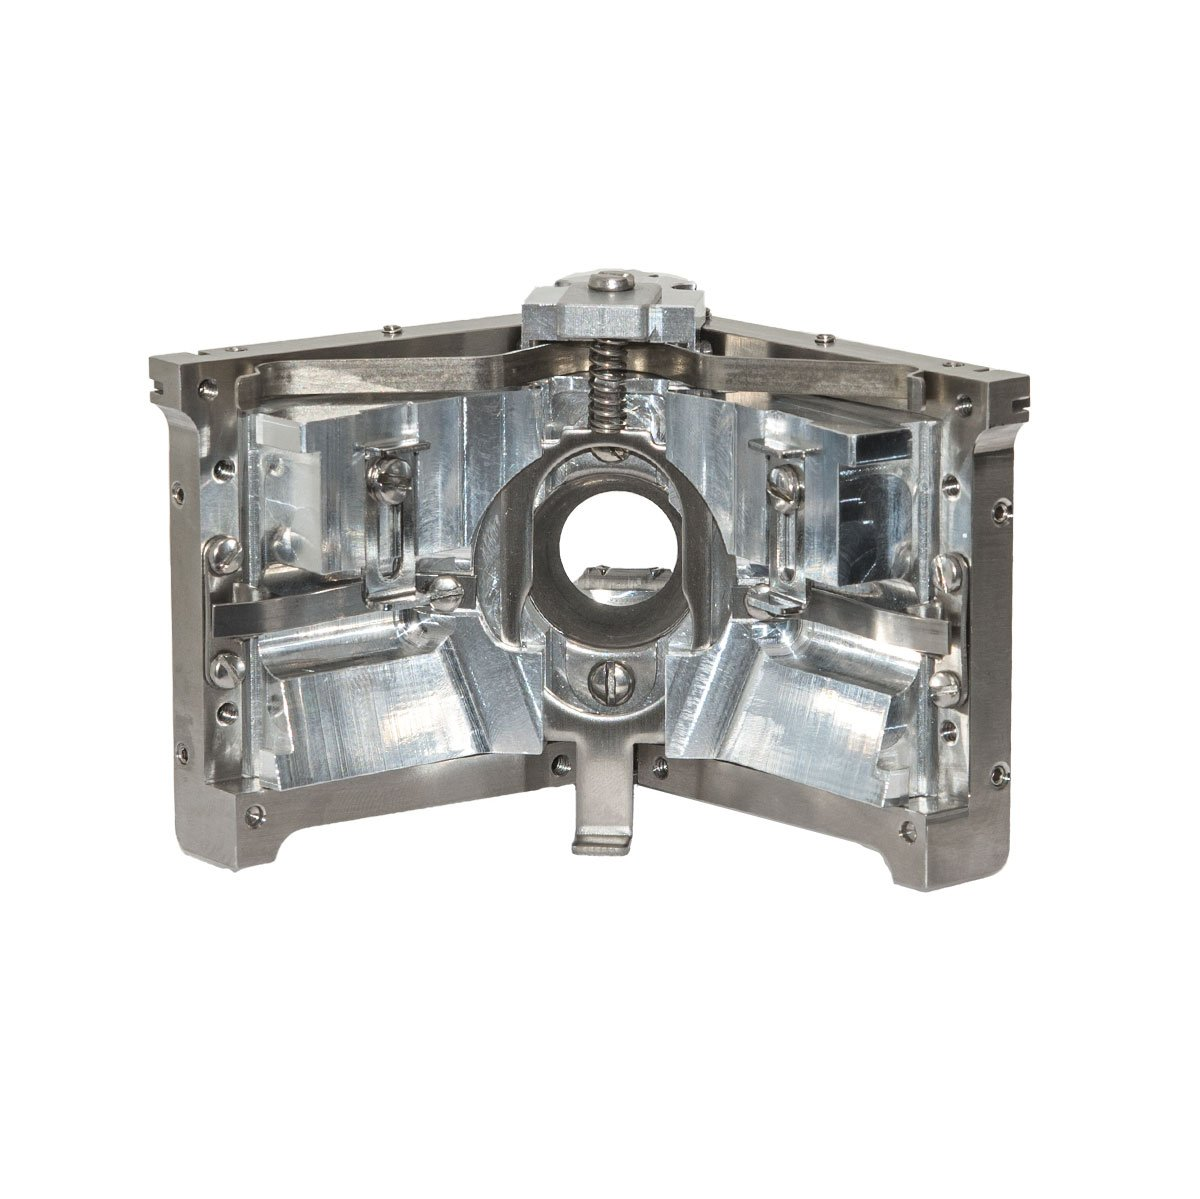 Drywall Master BoneHead Angle Head Corner Finisher - Made in USA (3'' with Wheels)